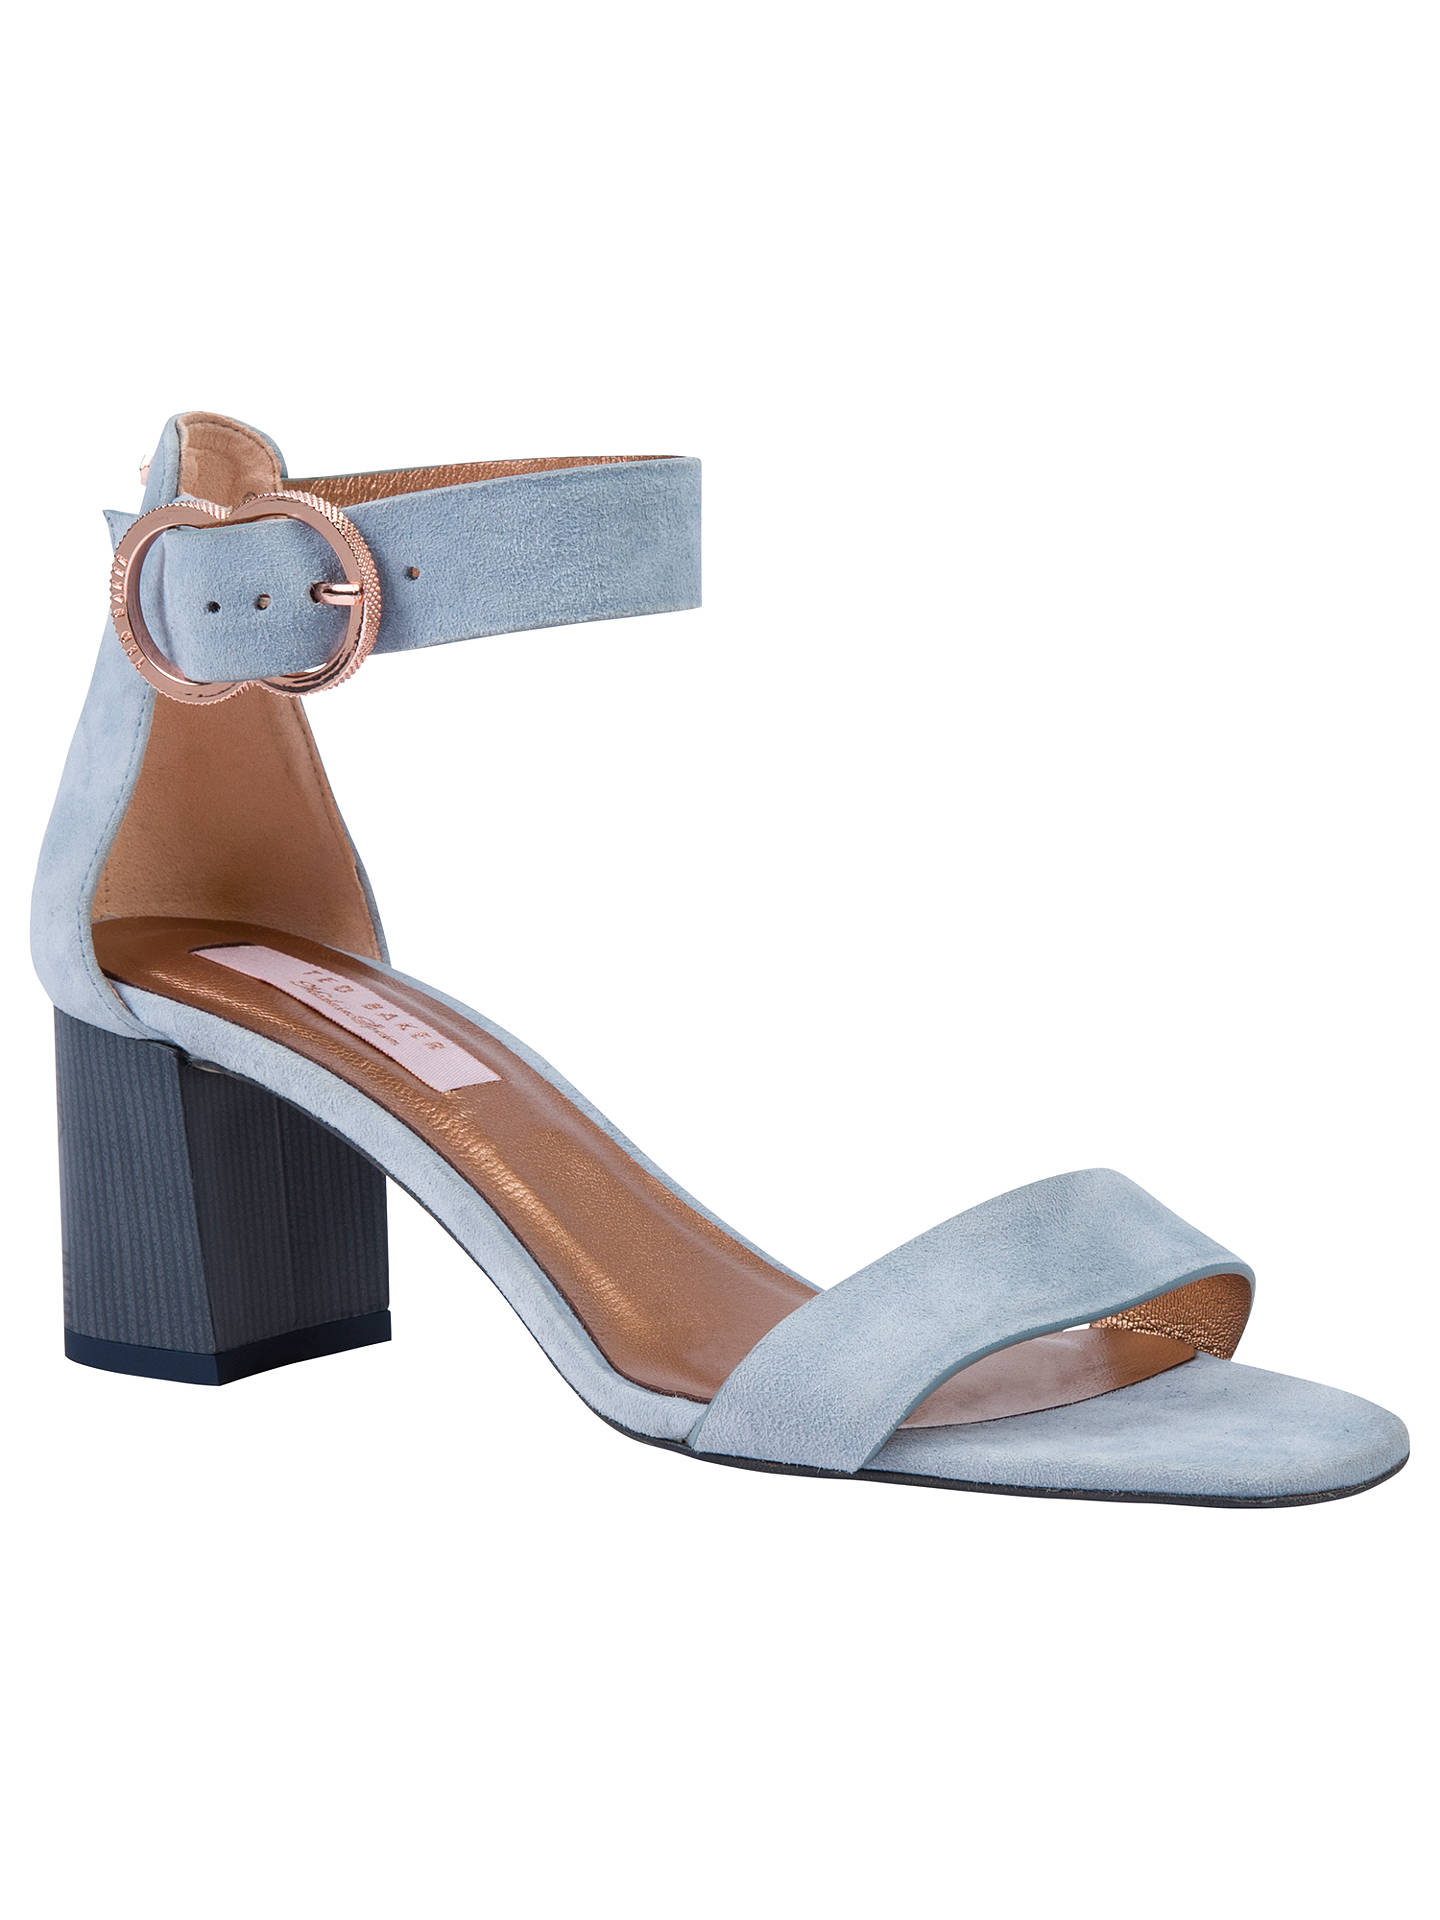 0d578cf4f15398 Ted Baker Qarvas Block Heel Sandals at John Lewis   Partners